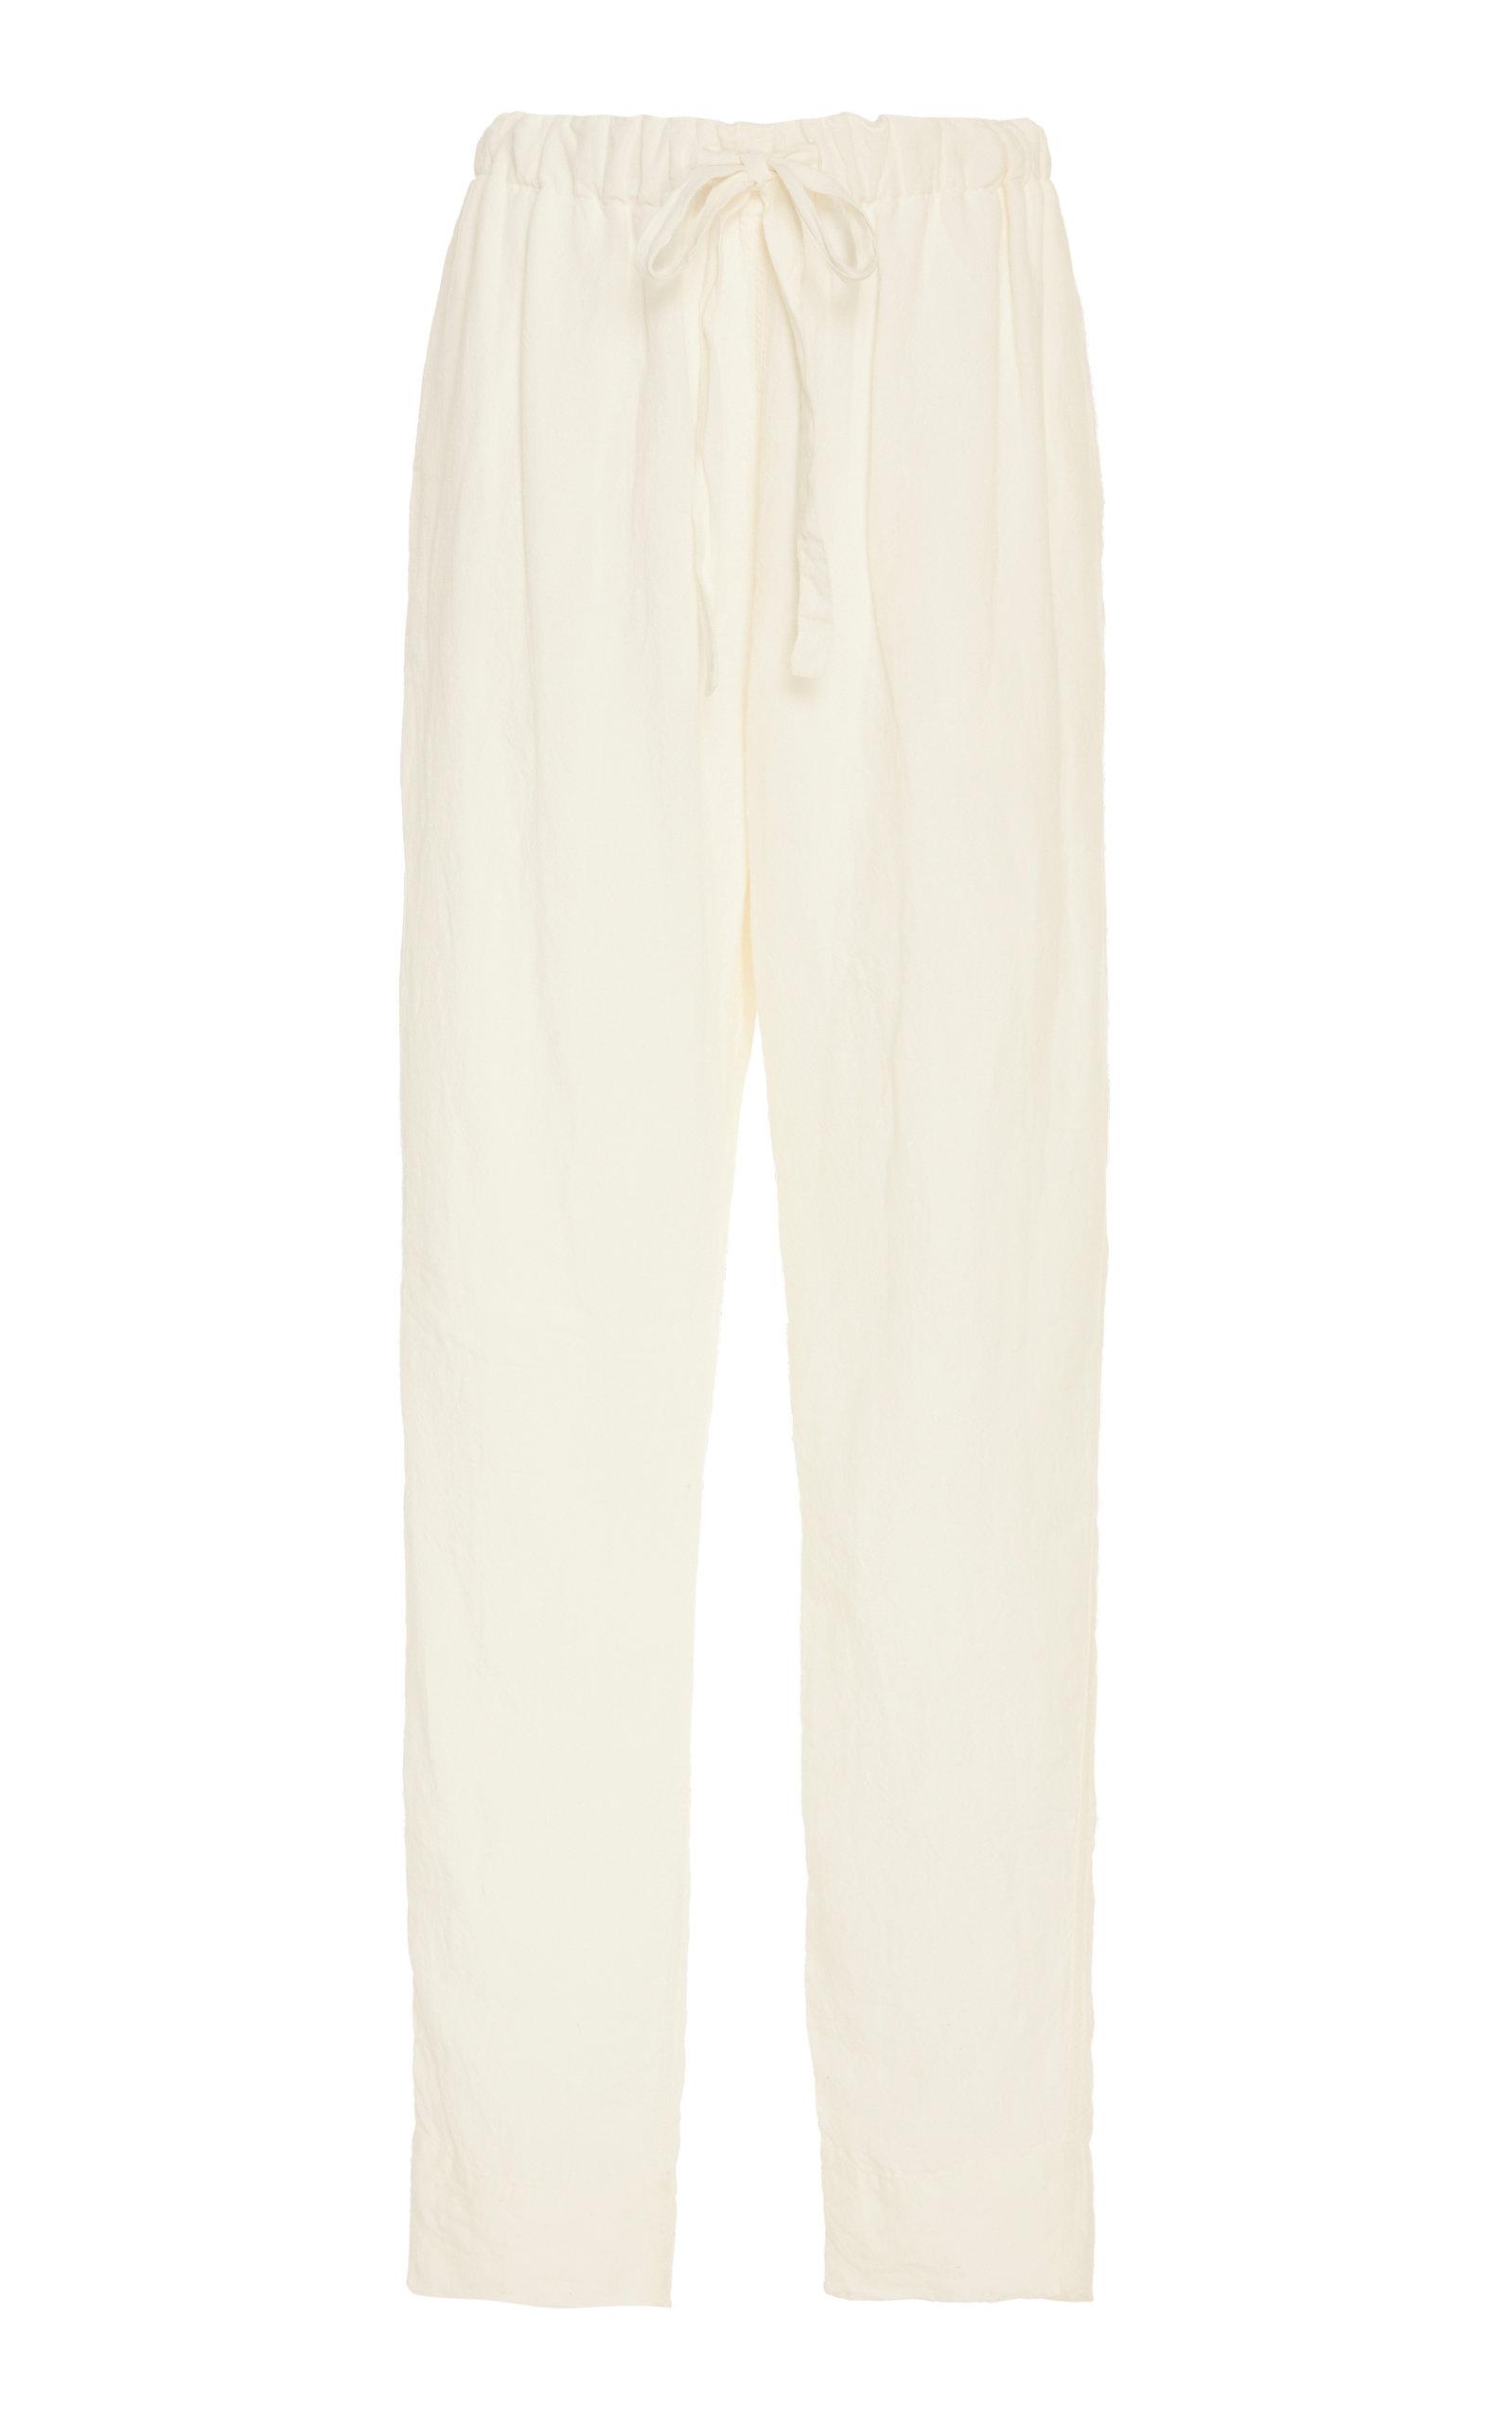 89e64a0b Bassike Herringbone Cotton-Jersey Straight-Leg Pants In White ...